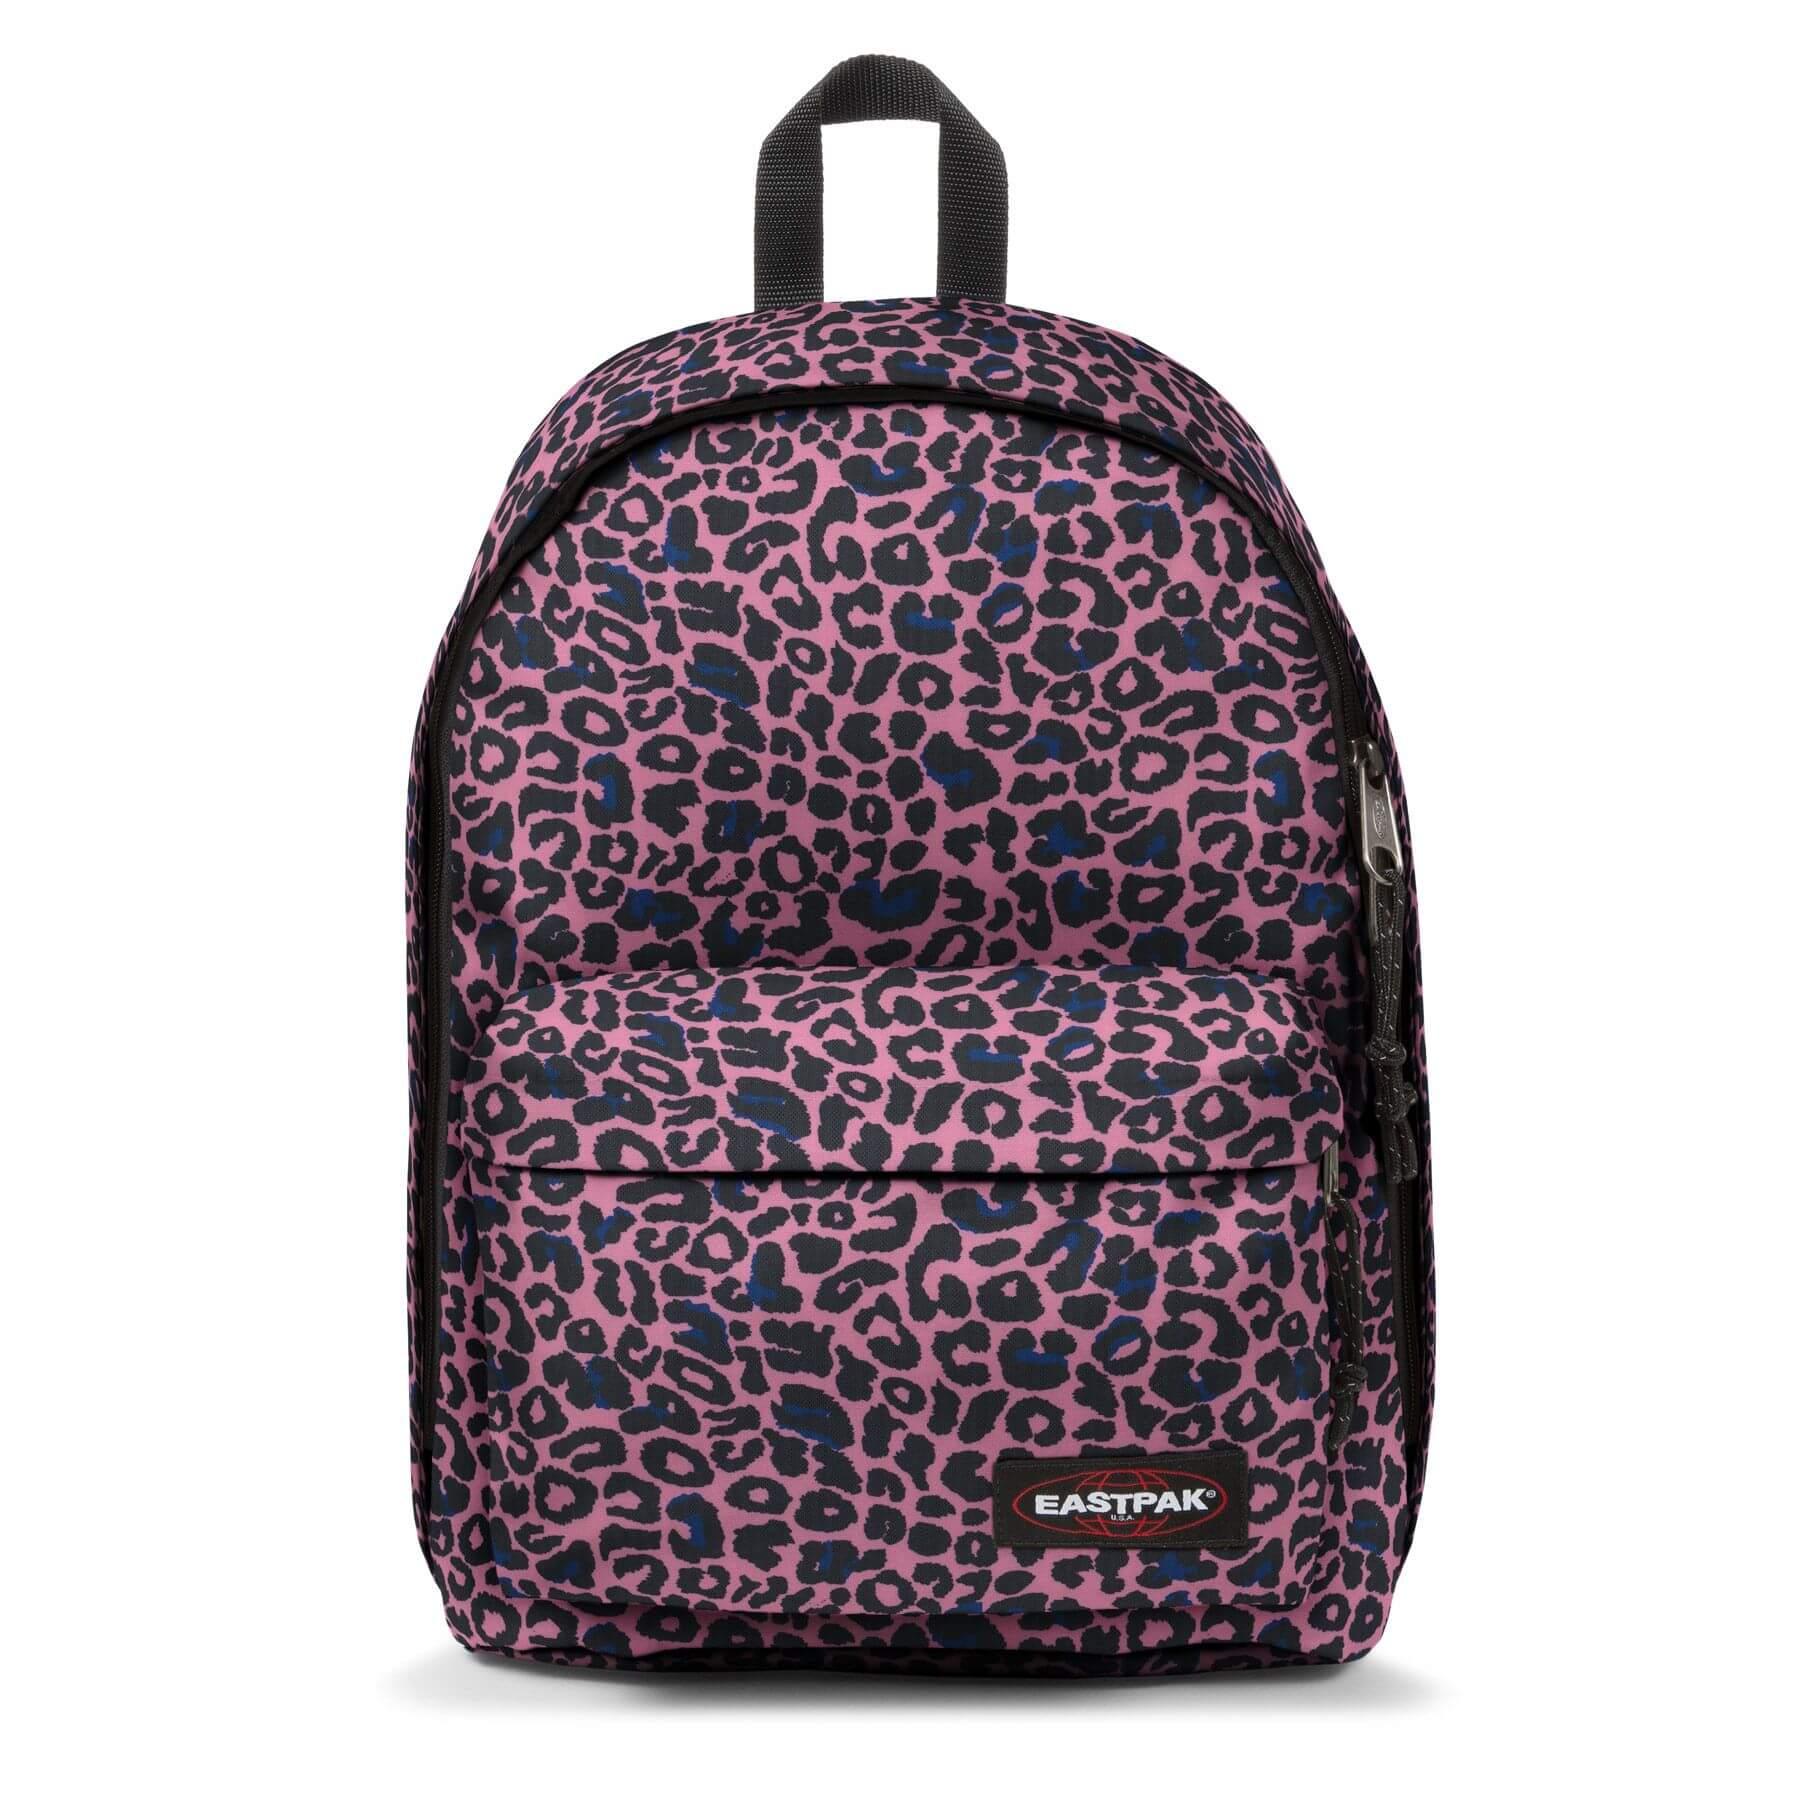 Eastpak Out Of Office Safari Leopard